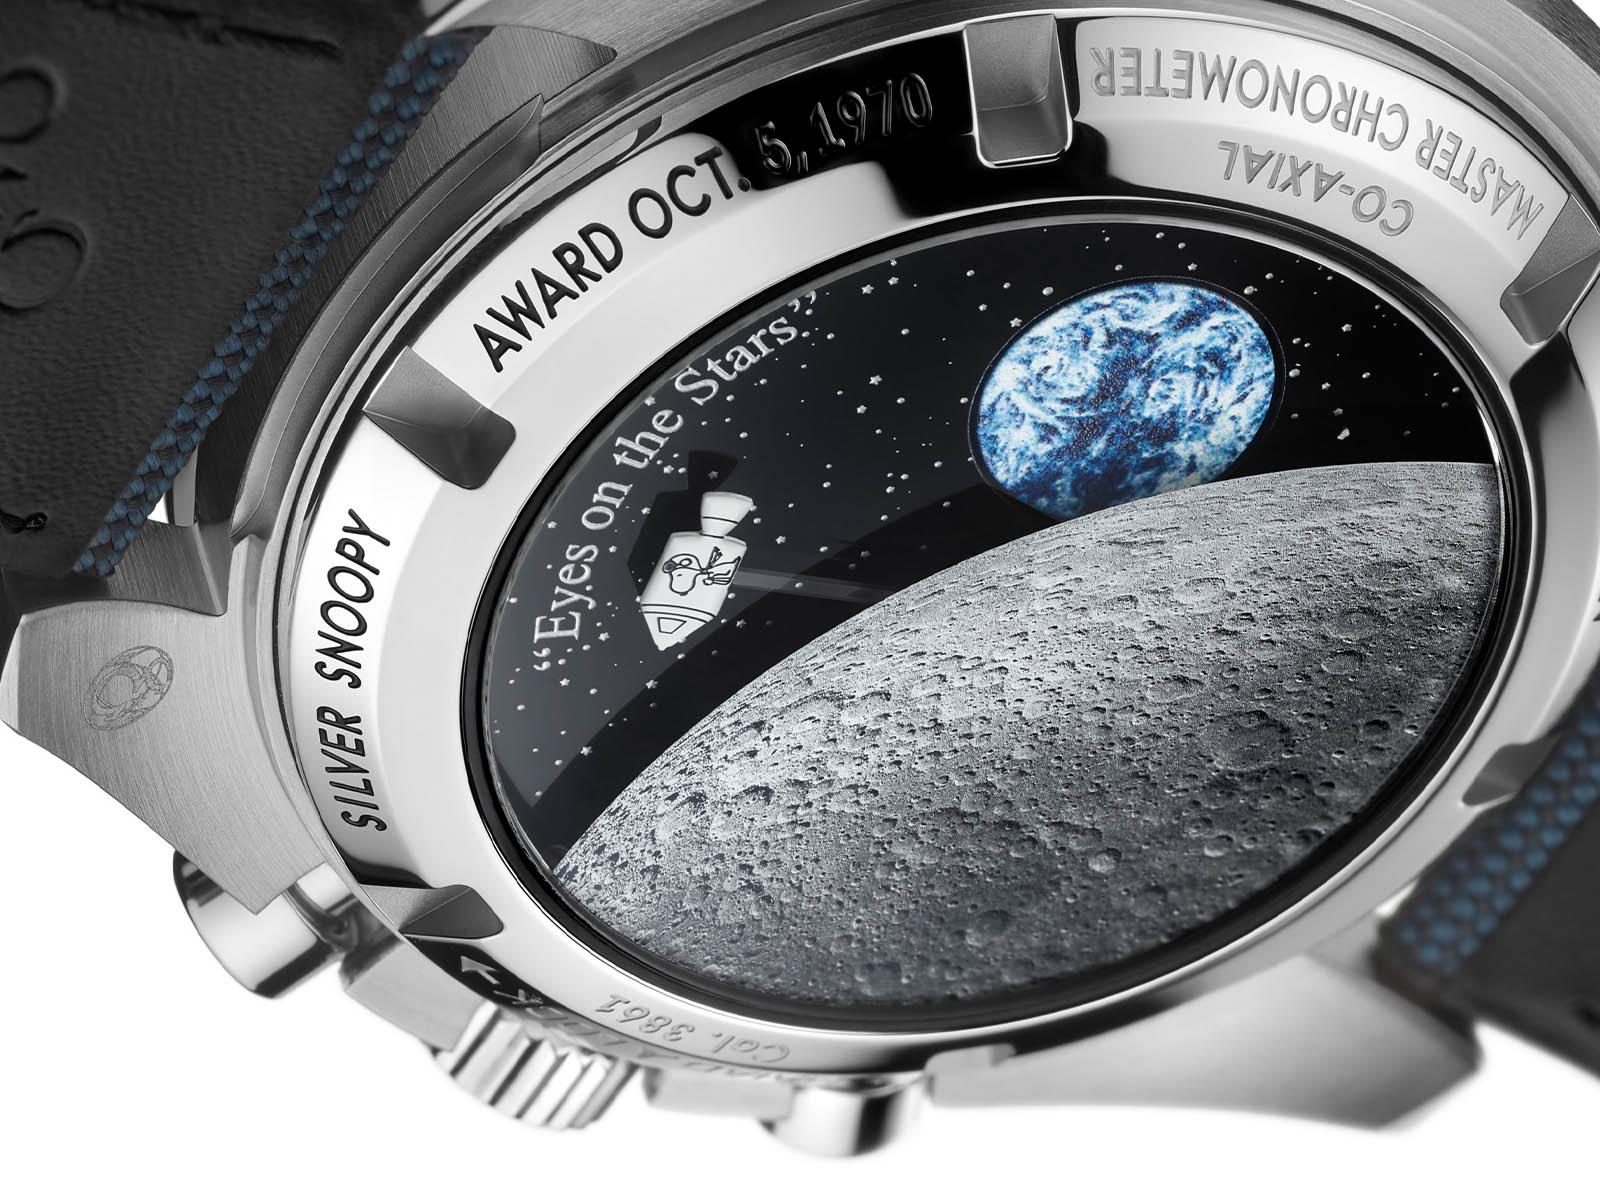 310-32-42-50-02-001-omega-speedmaster-silver-snoopy-award-50th-anniversary-6.jpg